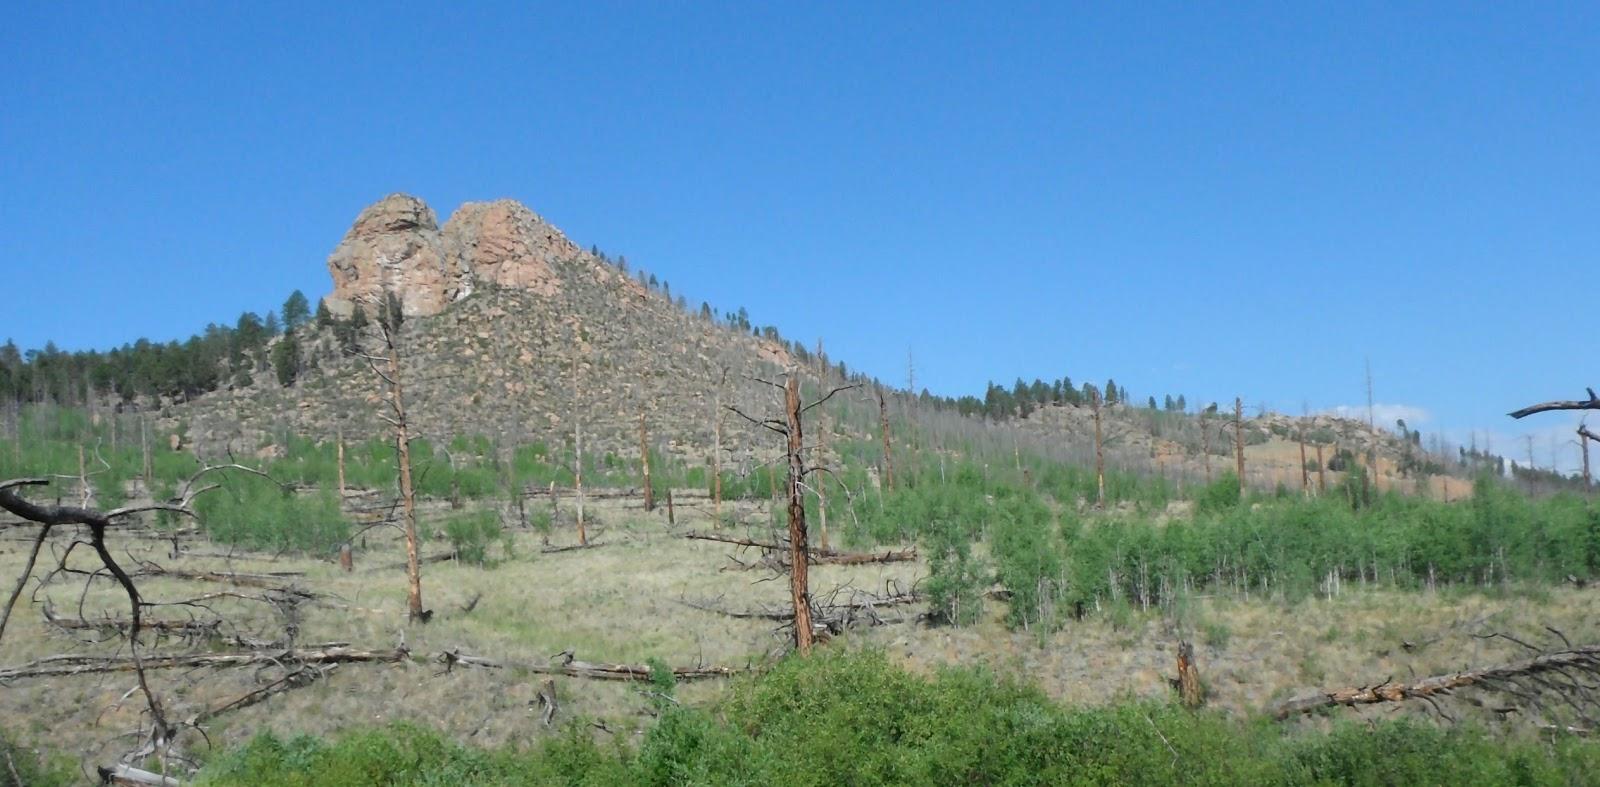 Rockhounding the Rockies: Falling under the Smoky Hawk Spell?